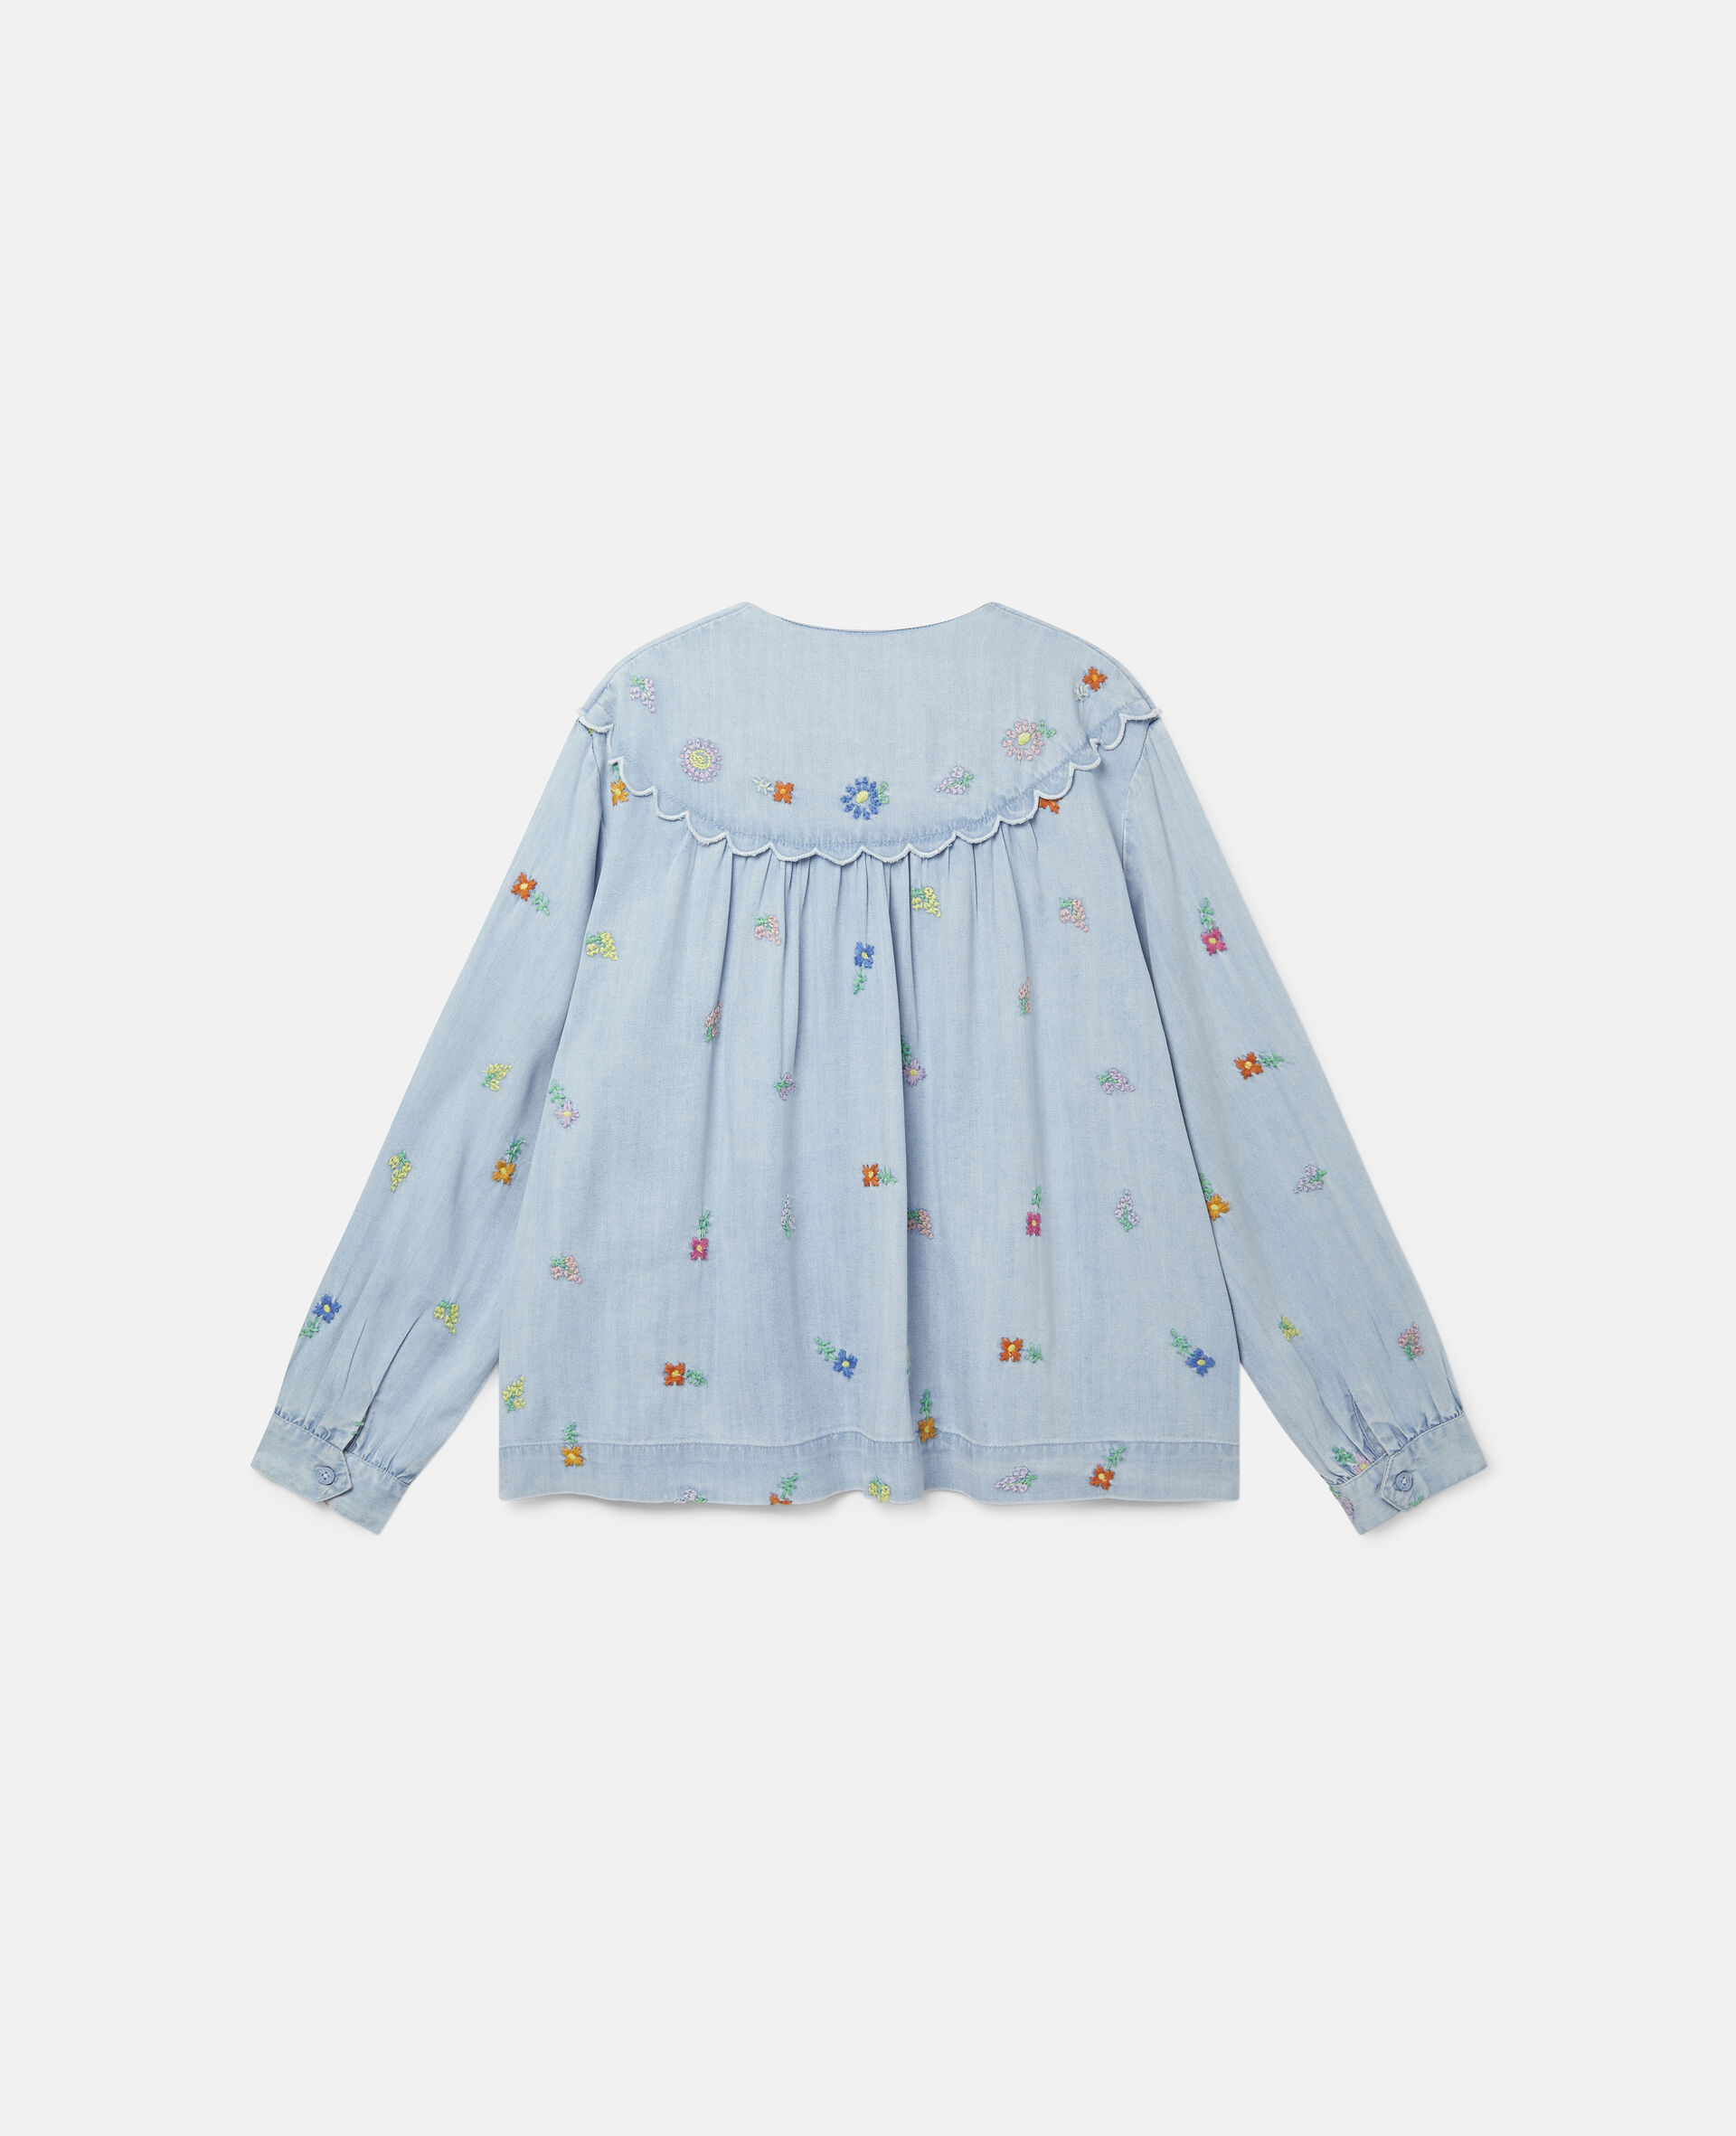 Embroidered Flowers Denim Shirt-Blue-large image number 3